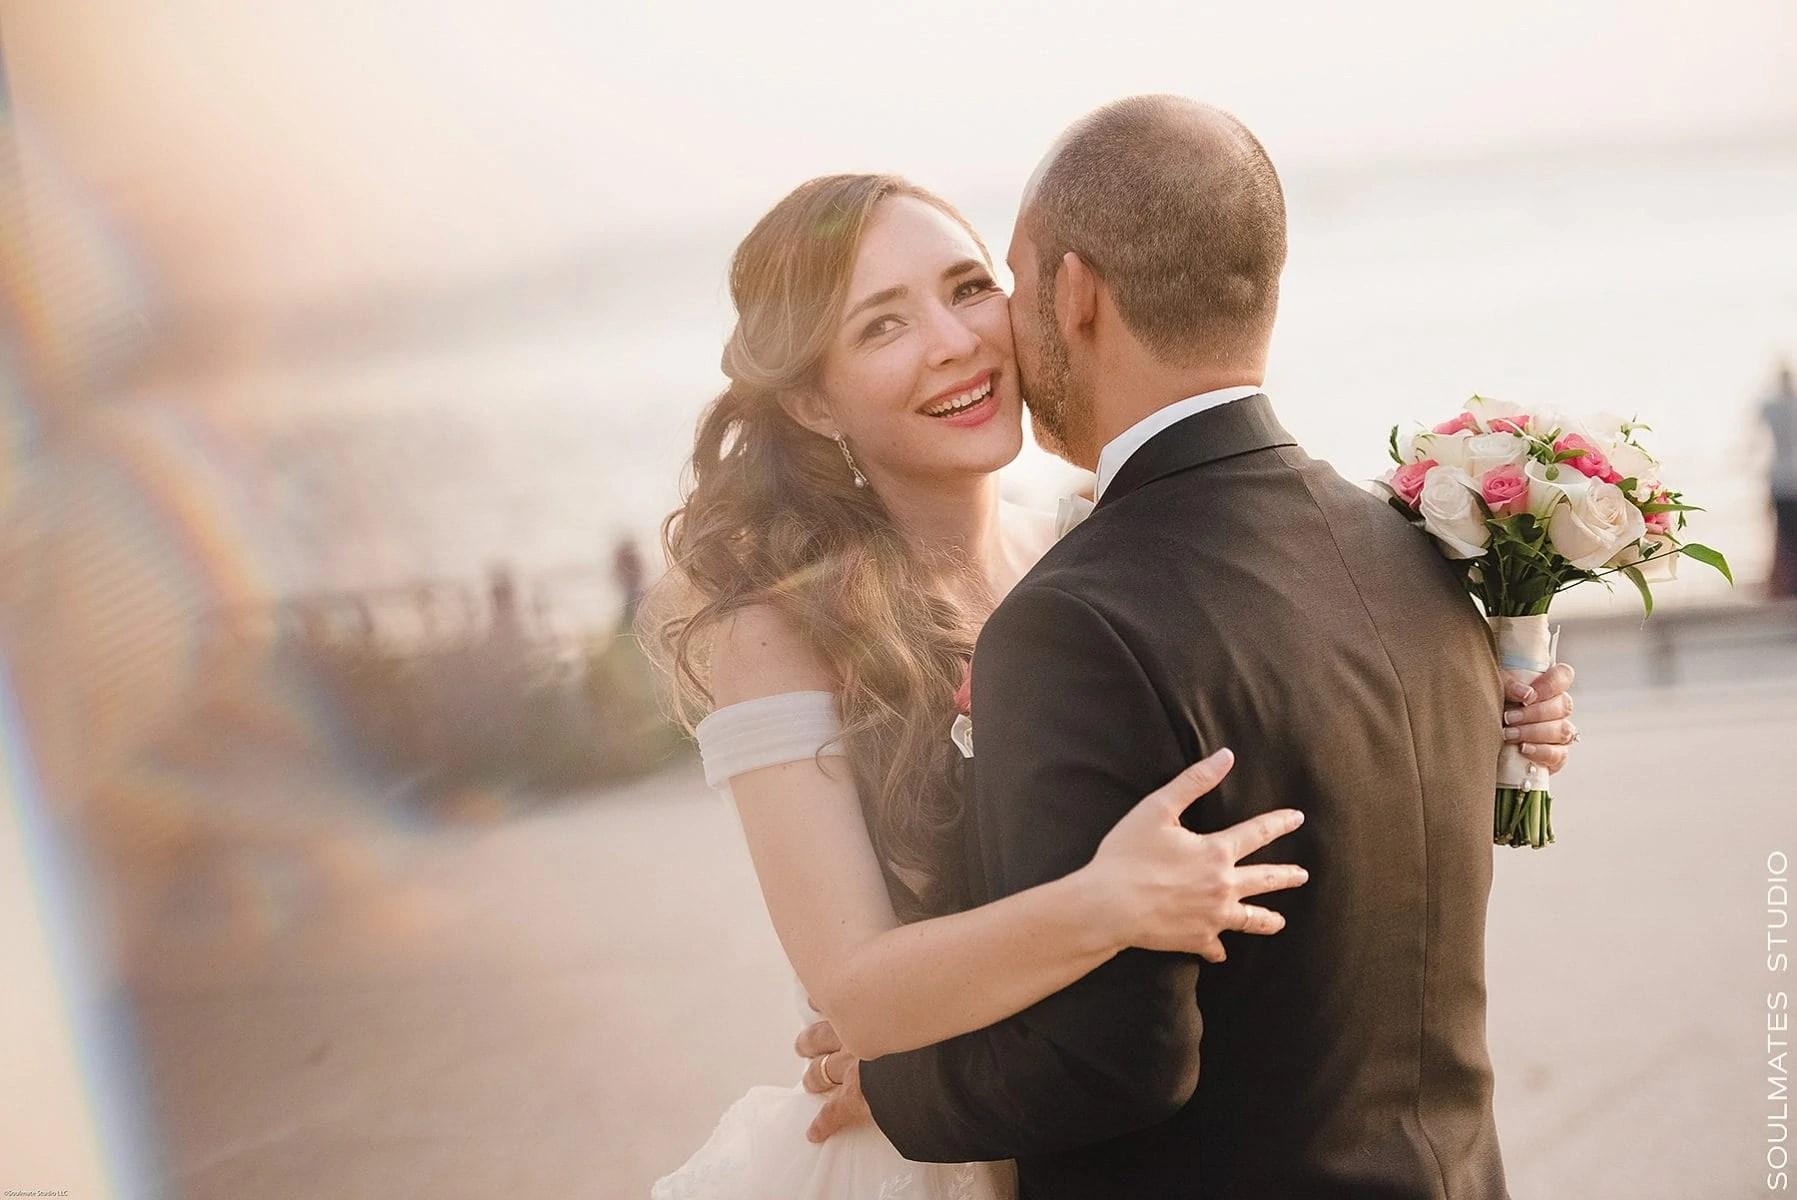 Bride hugging the Groom during wedding session at Battery Garden Park